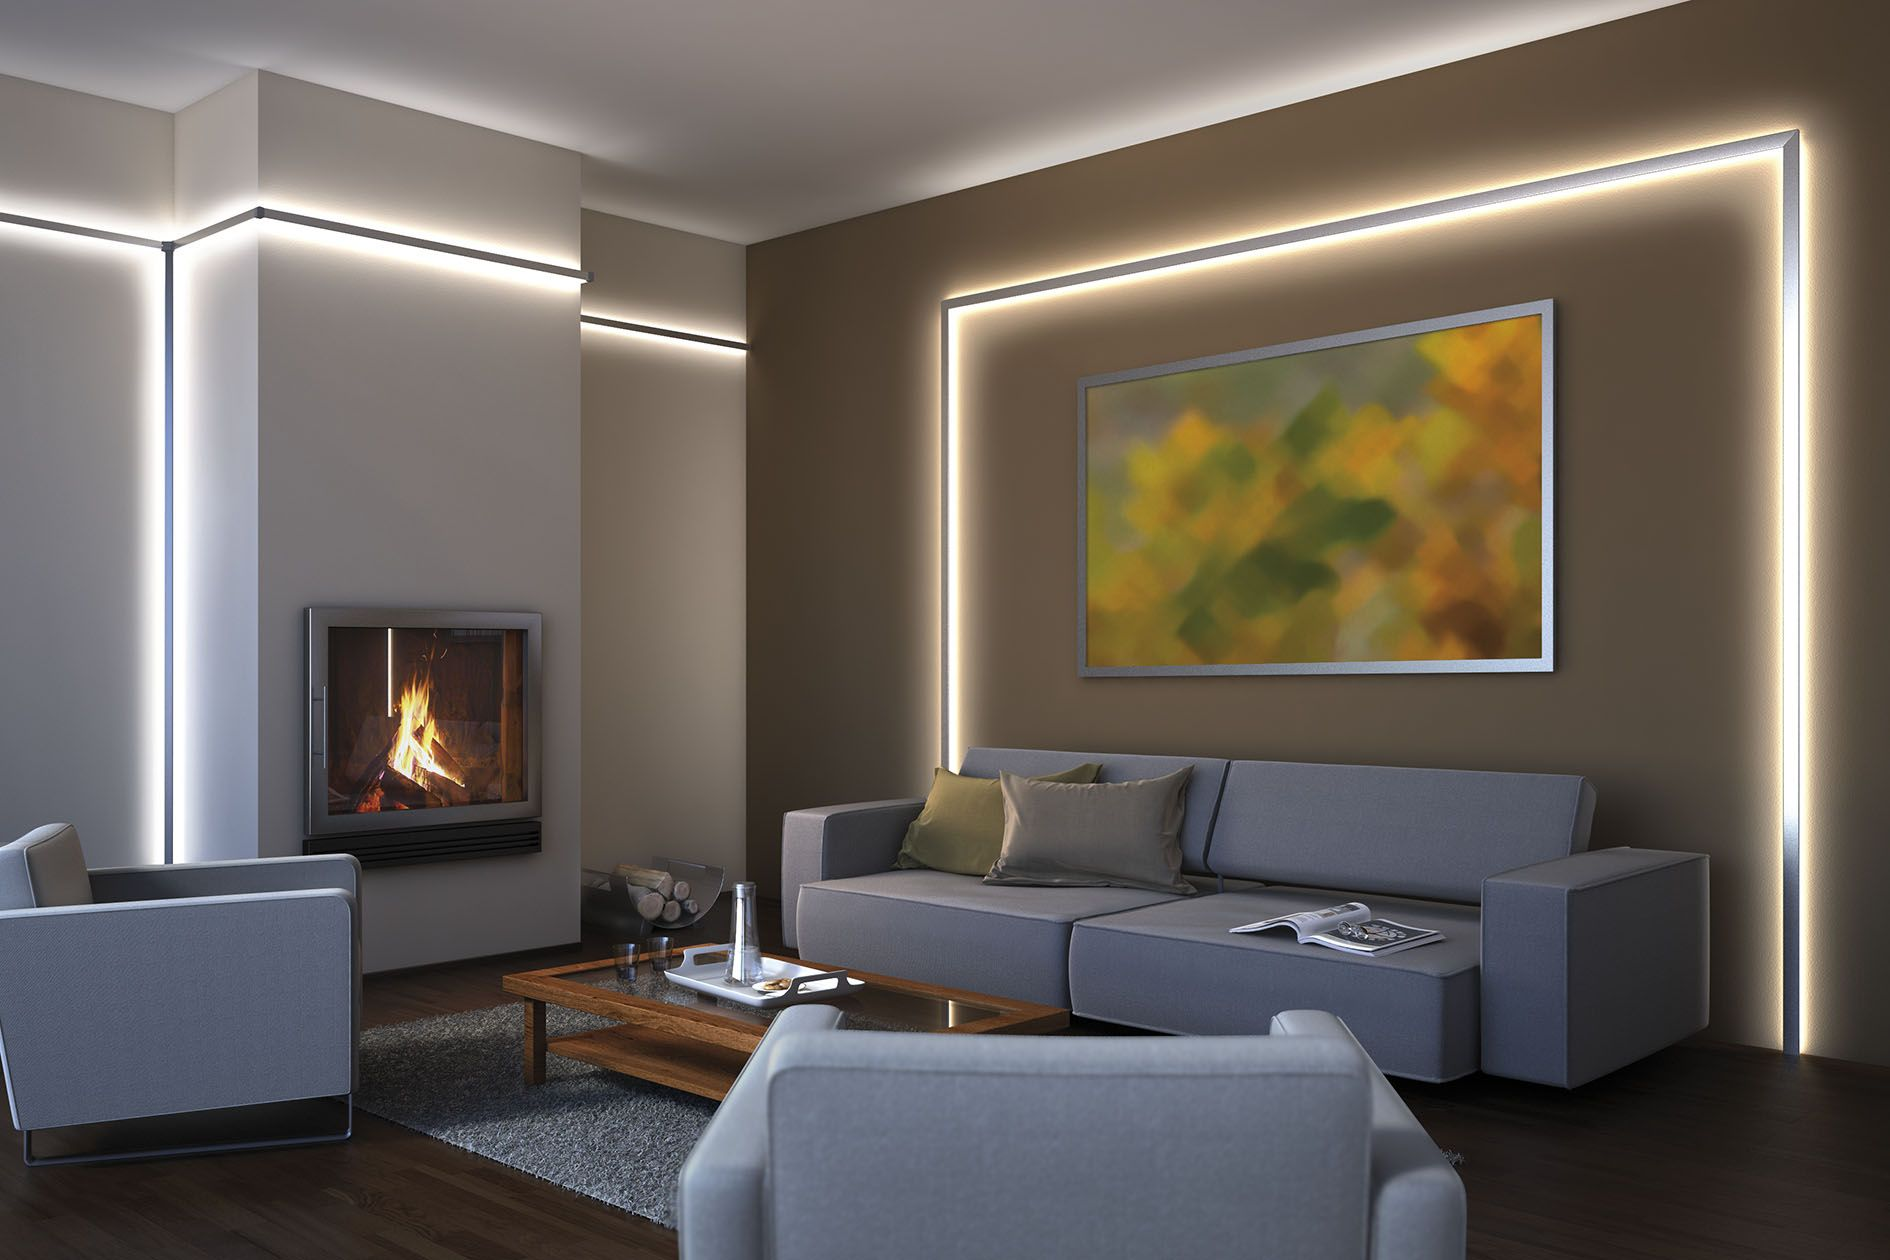 paulmann led profiles   İç aydınlatma / indoor lighting, Wohnzimmer